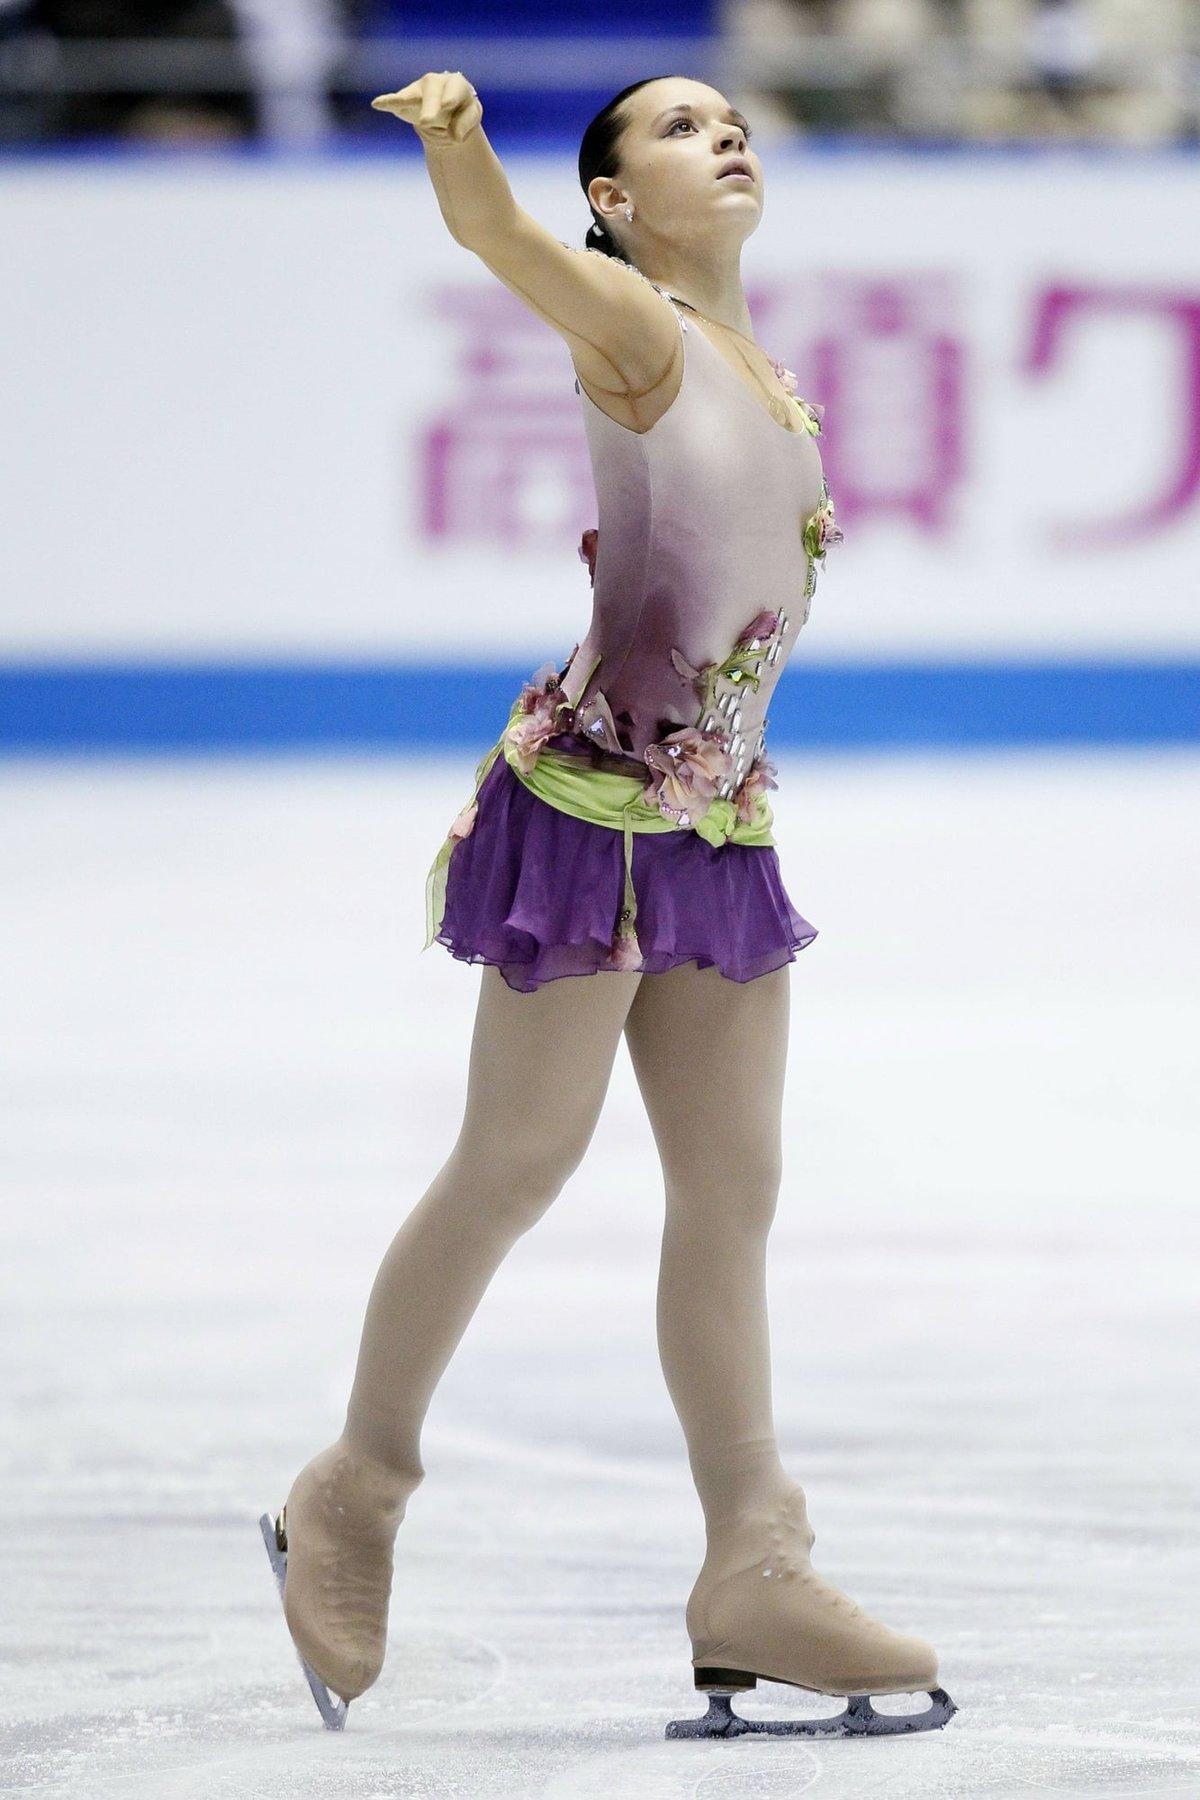 Эро фото фигуристки сотниковой на льду #1